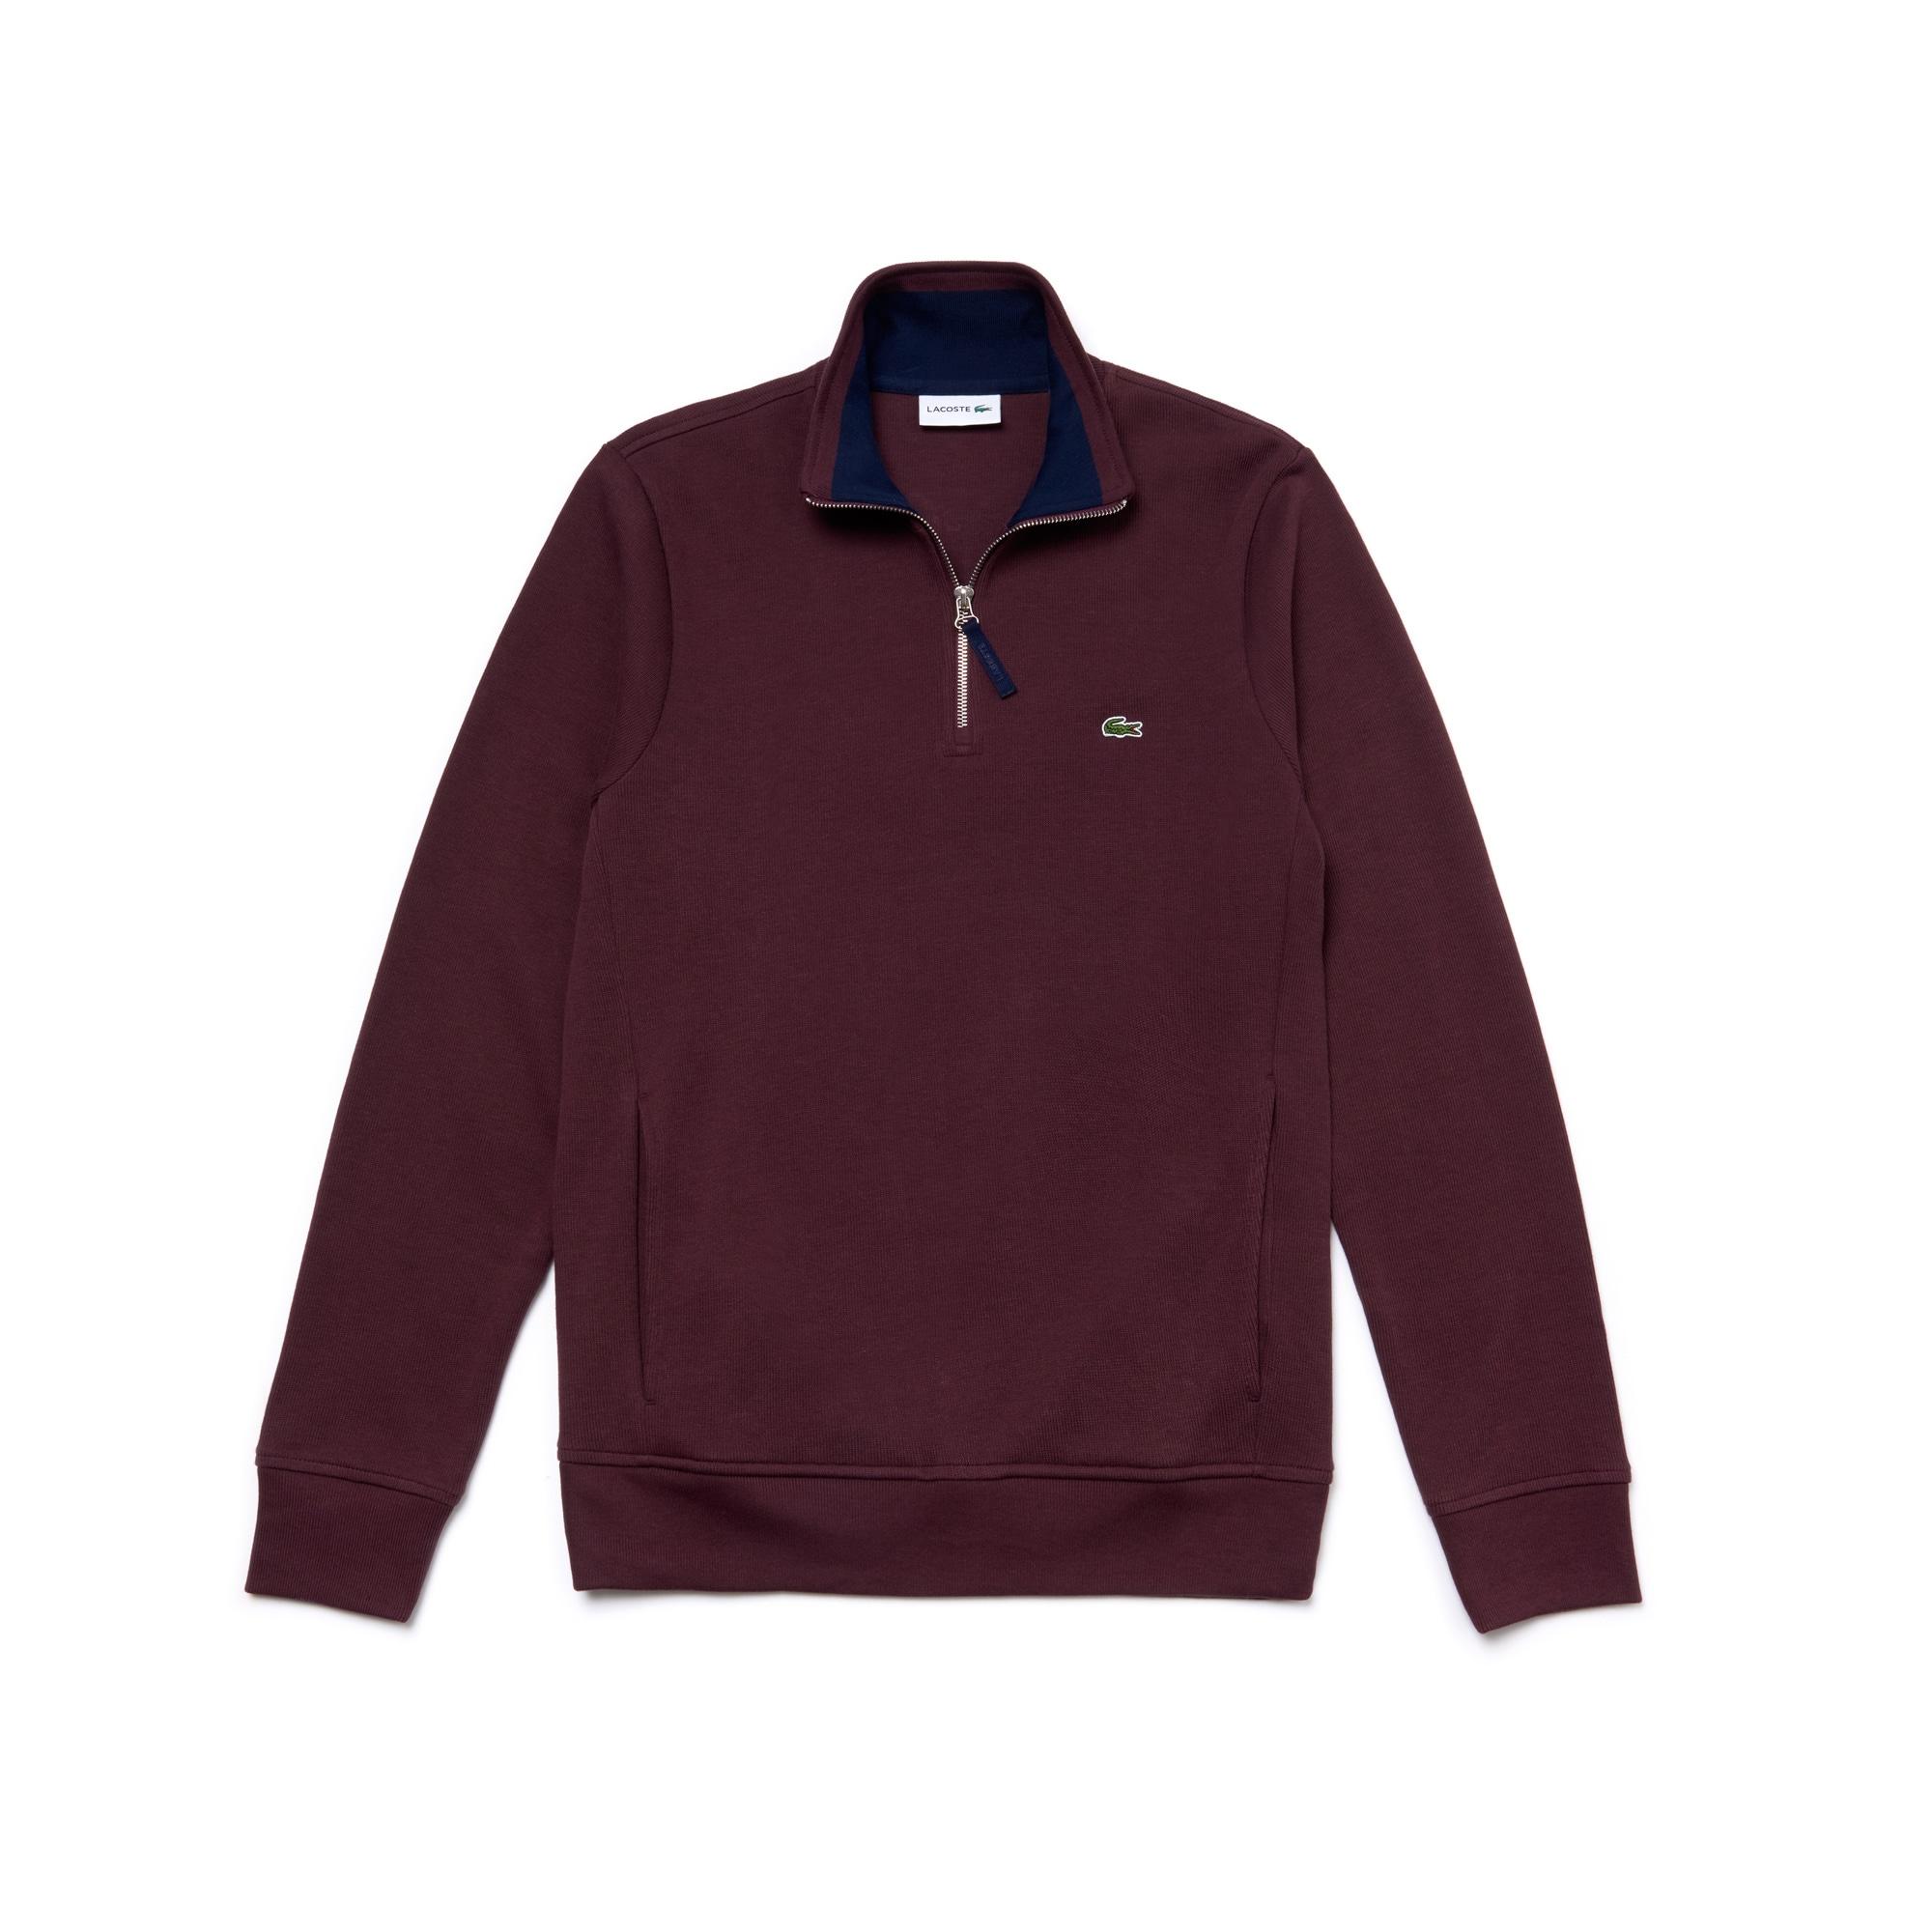 Men's Flat Ribbed Zippered Stand-Up Collar Sweatshirt